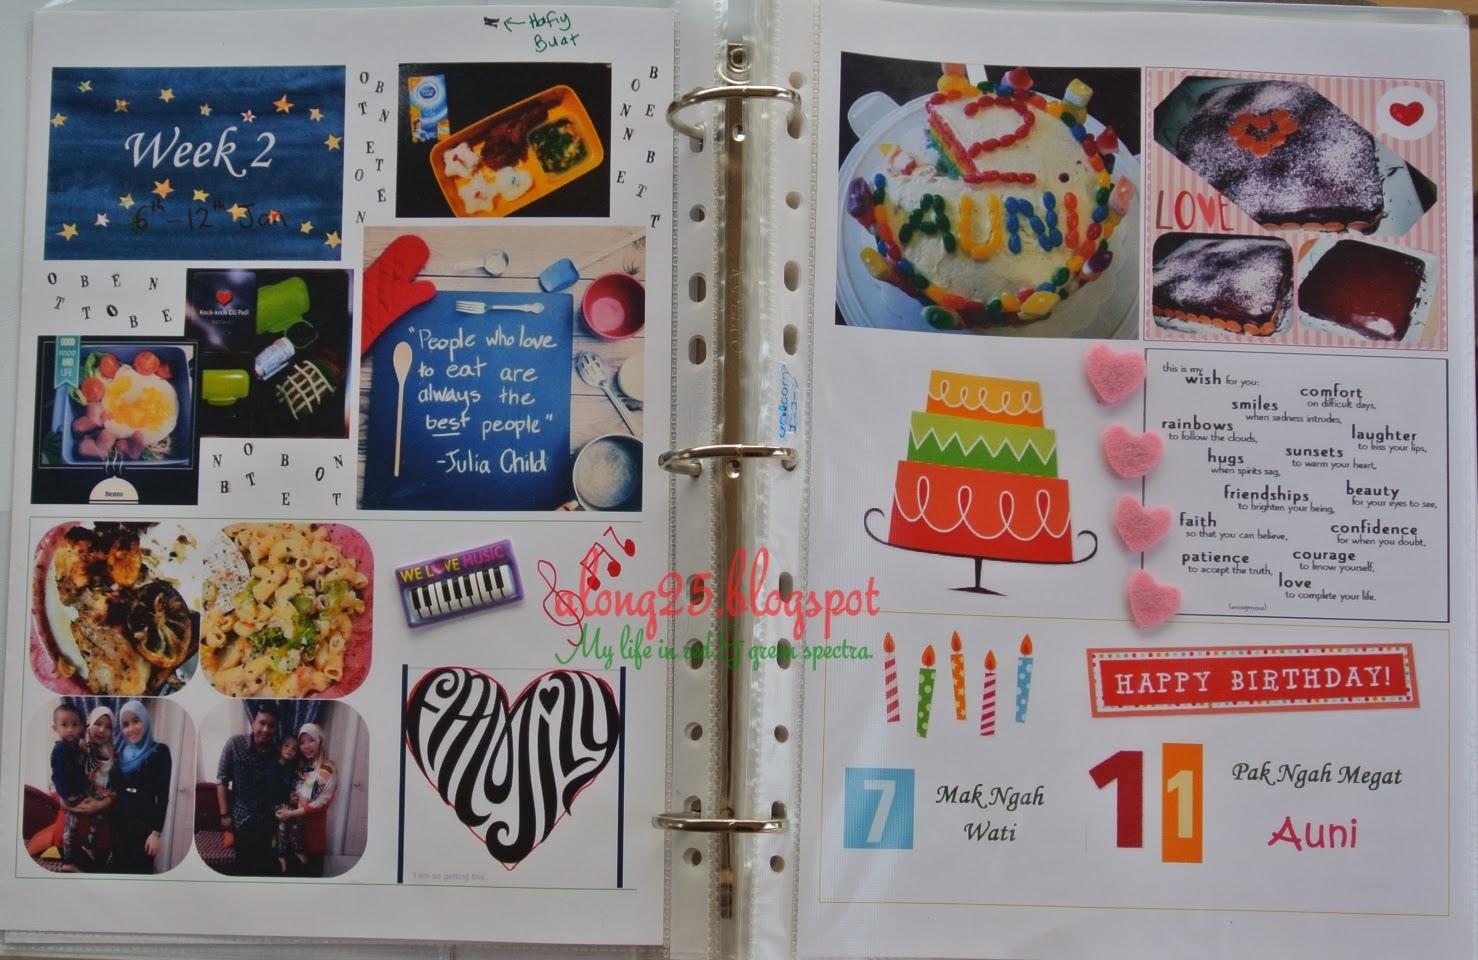 blog along25 project life 2014 malaysia art craft diari mingguan diari bergambar